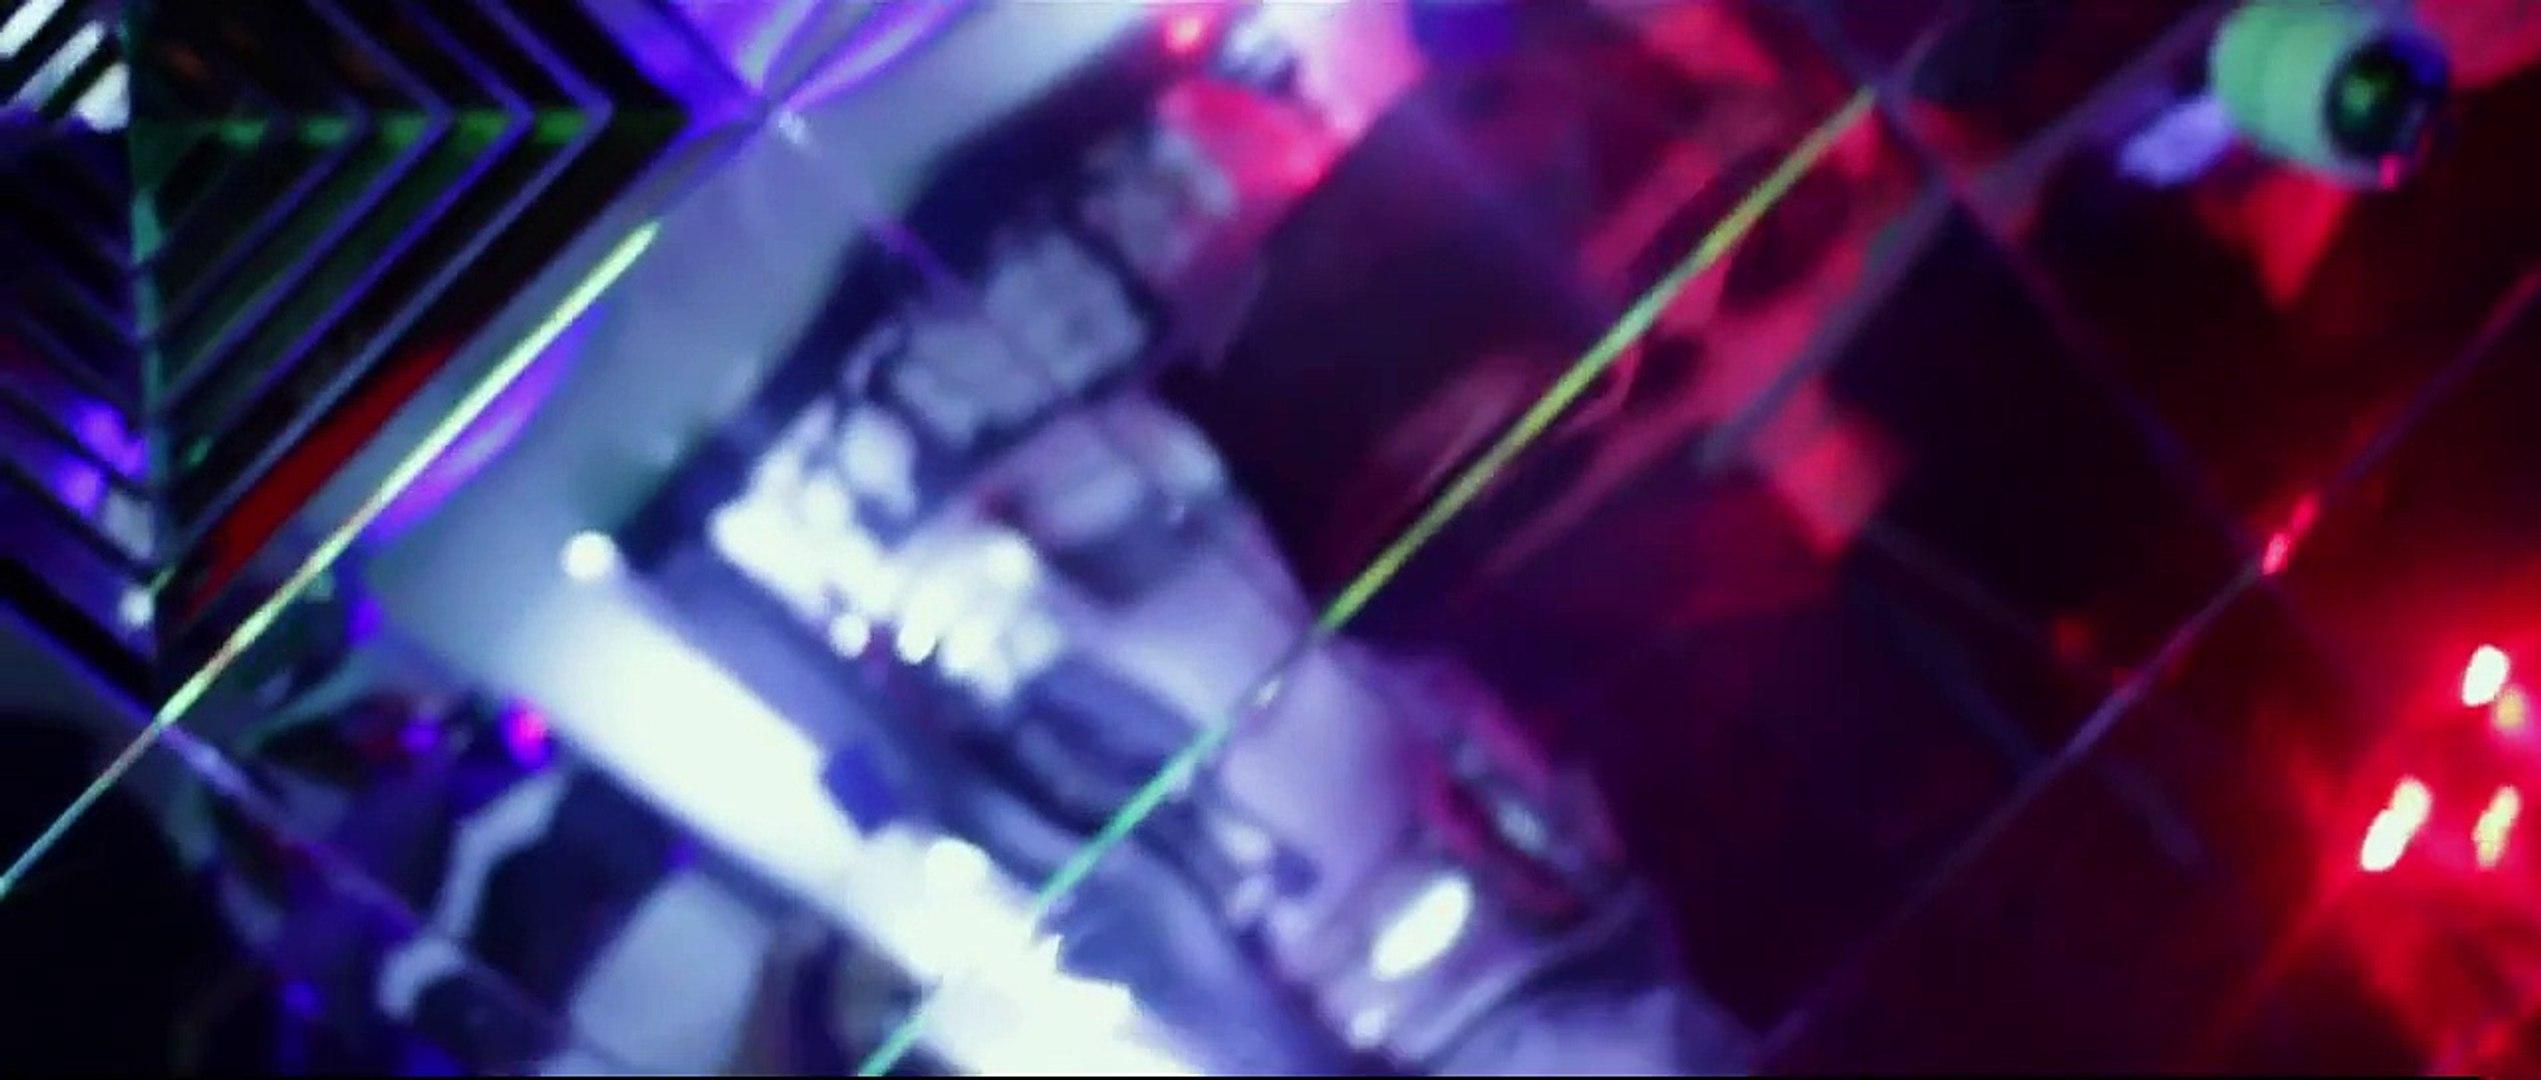 Paulo Mac ® feat. Dj Kakah - Tentação - 2015 (Kizomba/Zouk)